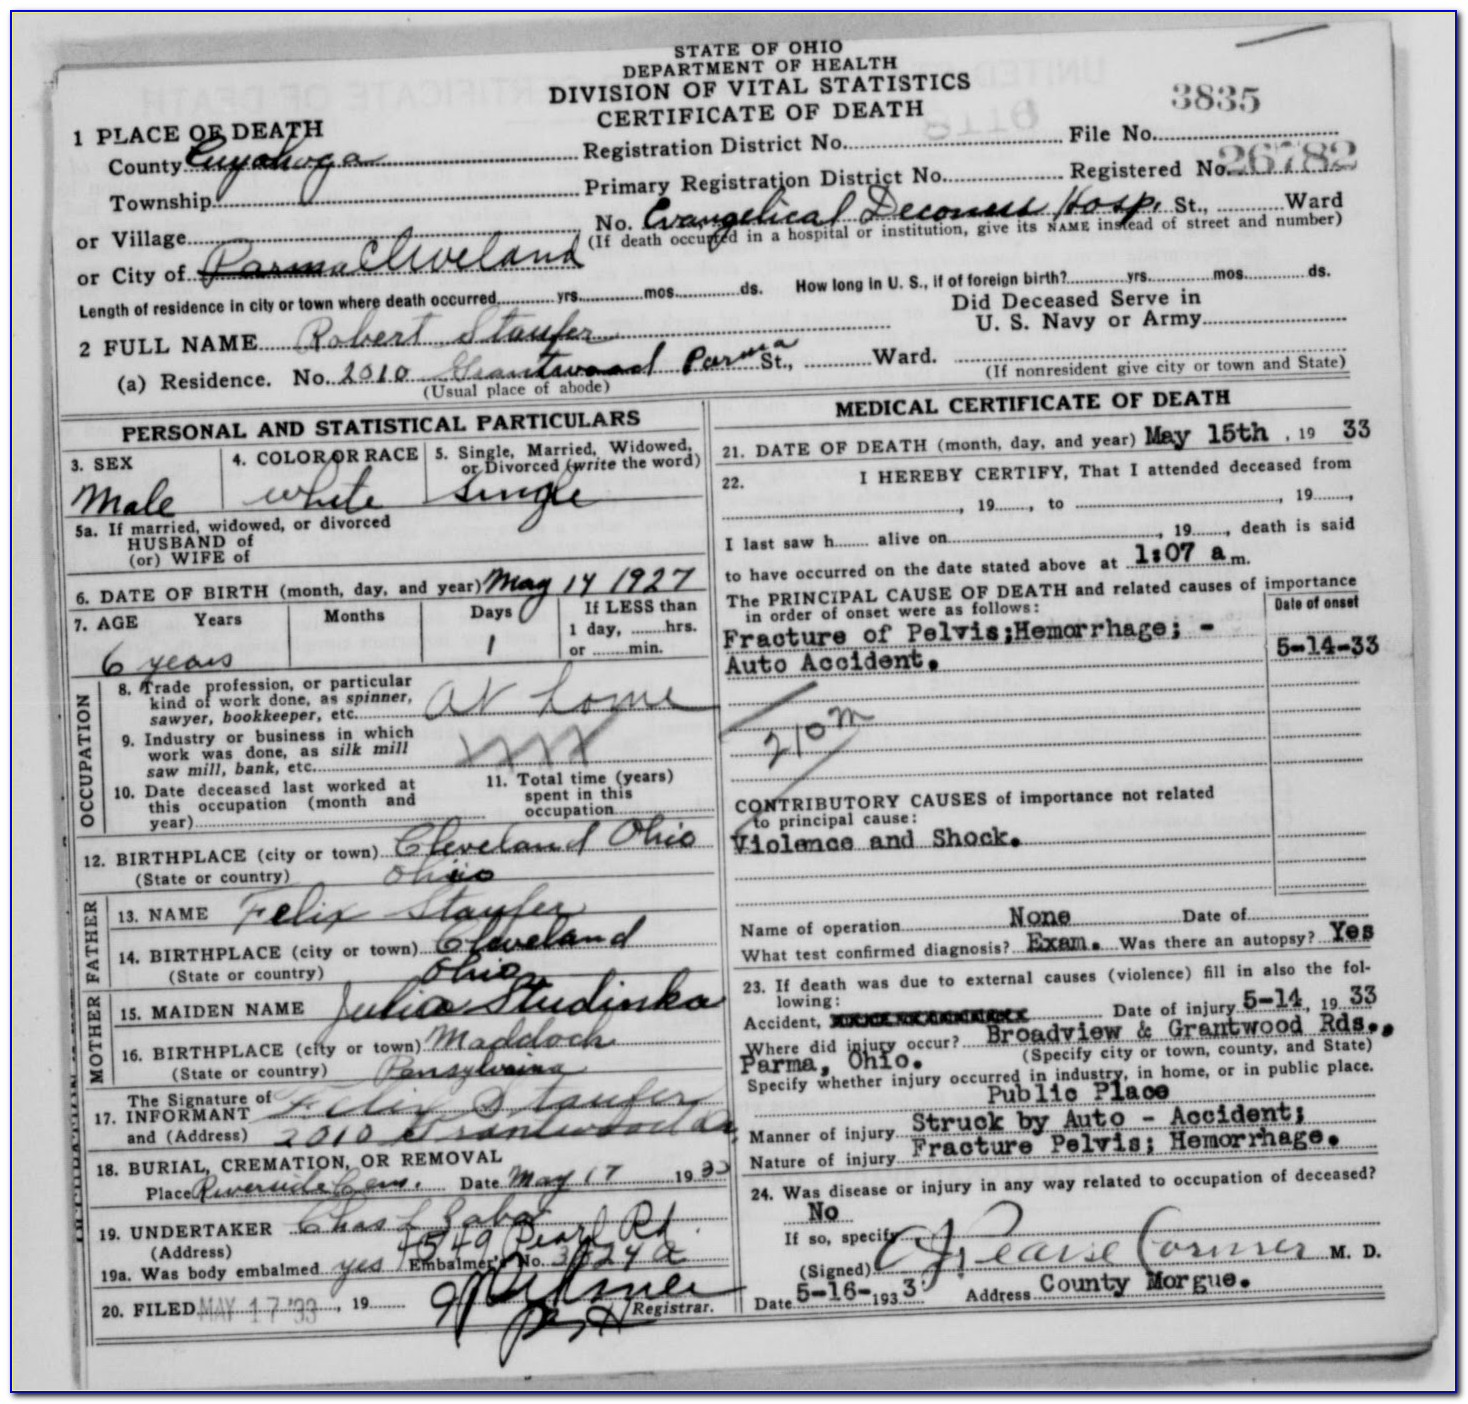 Cuyahoga County Ohio Death Certificates